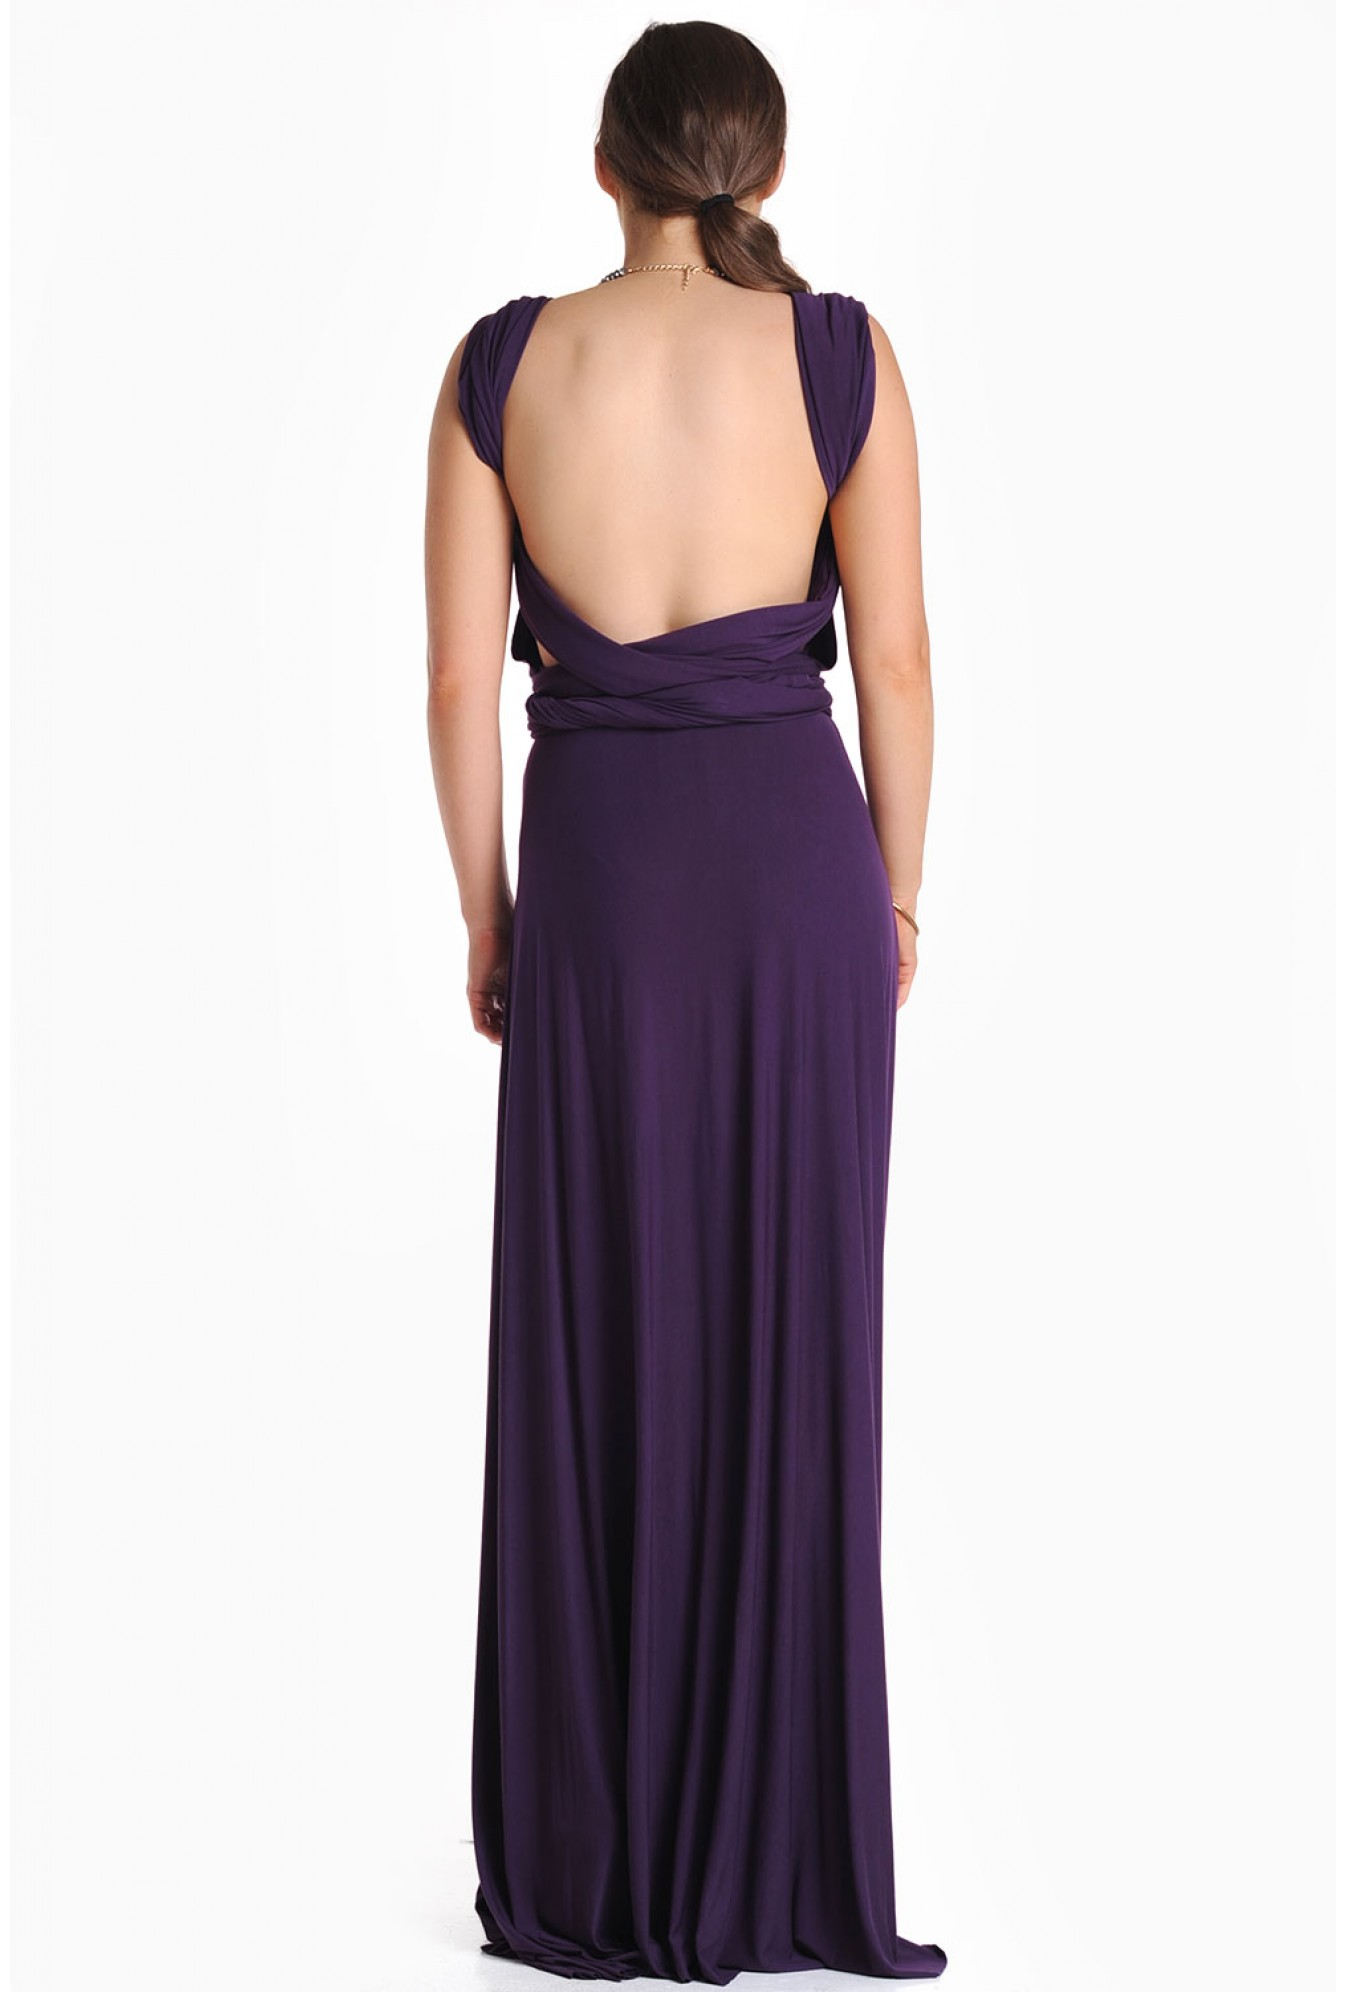 iCLOTHING Blair Multi Way Maxi Dress in Purple  12266853c29f